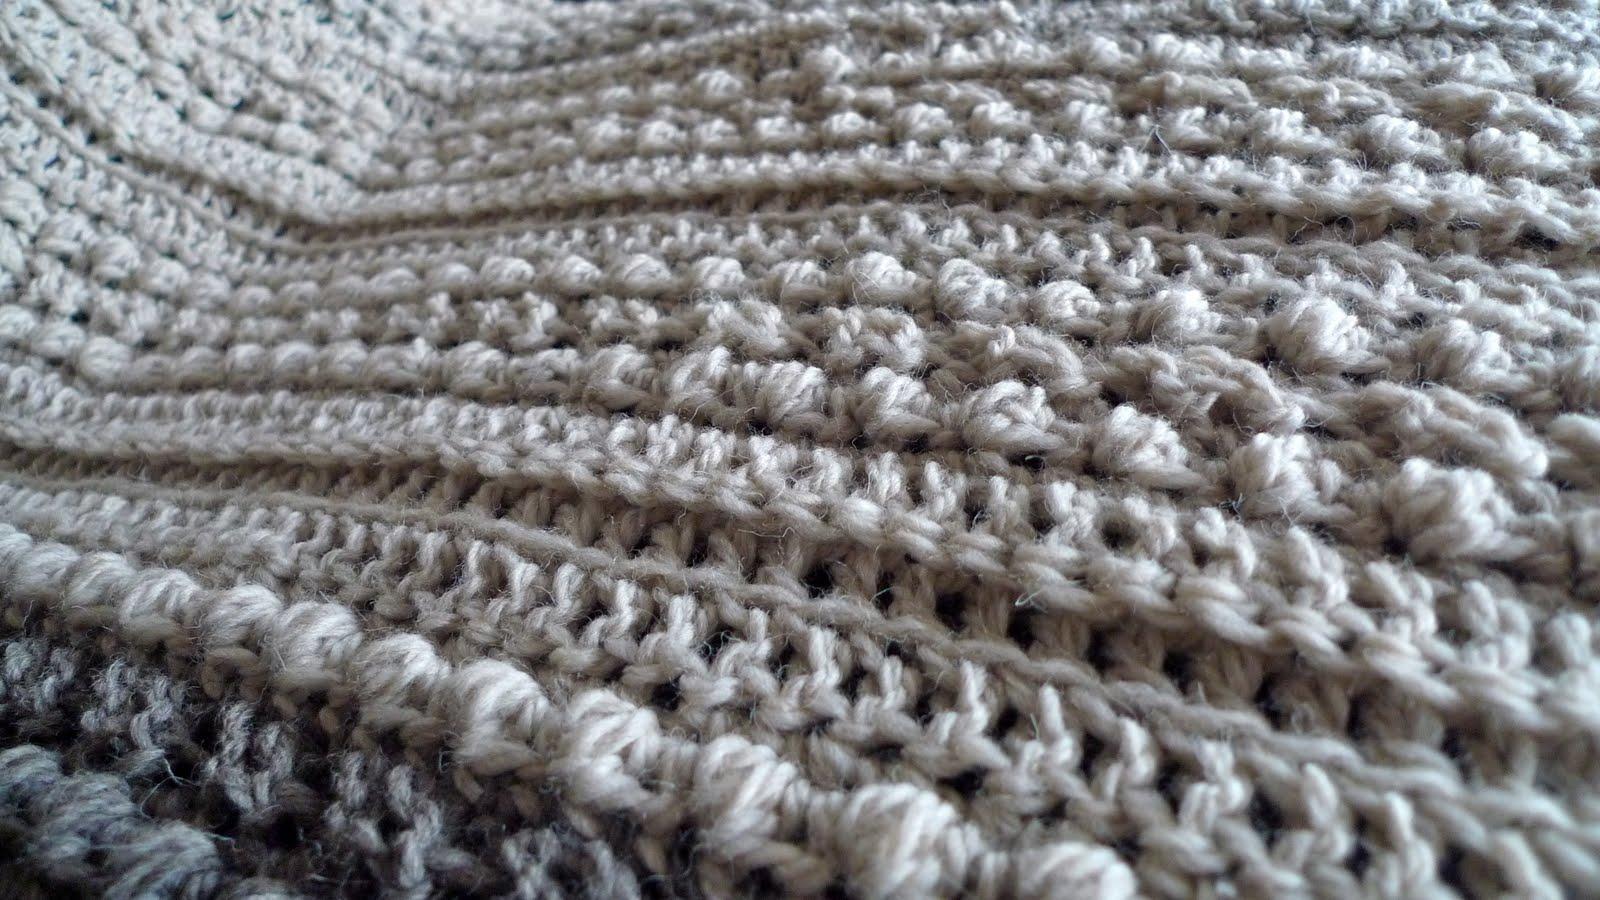 Queen Heron Creations: Crocheted Aran Afghan in Progress